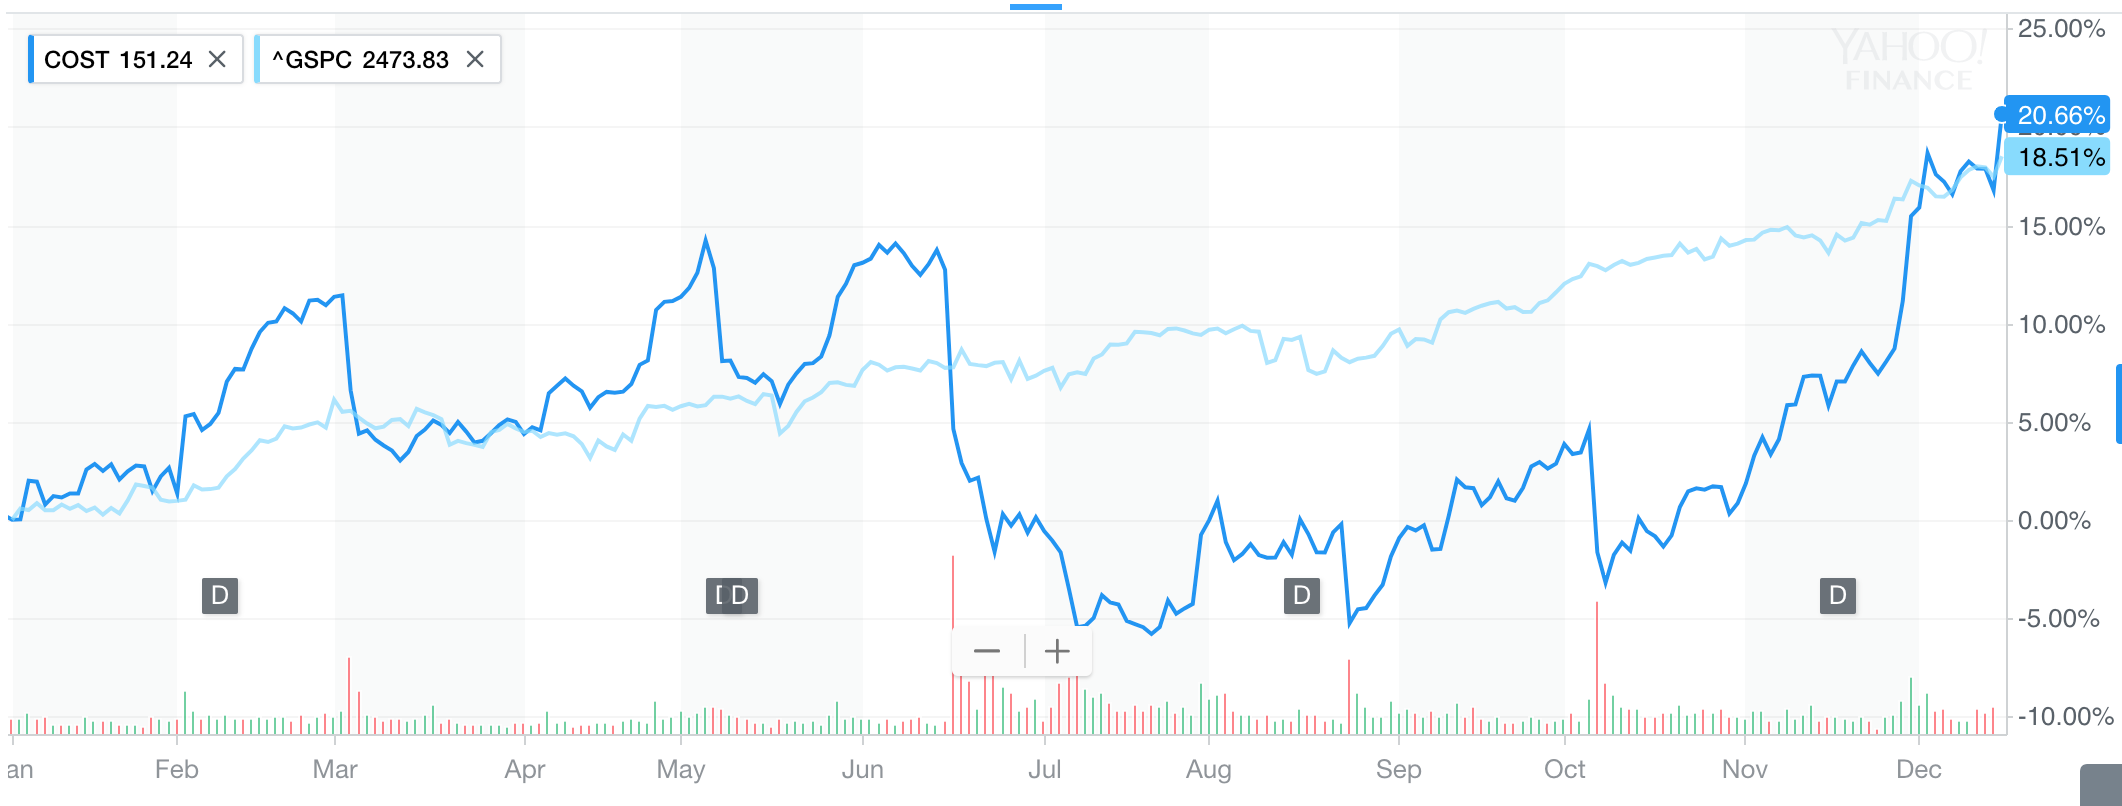 Costco Stock Quote Costco Is Anything But Dead  Costco Wholesale Corporation Nasdaq